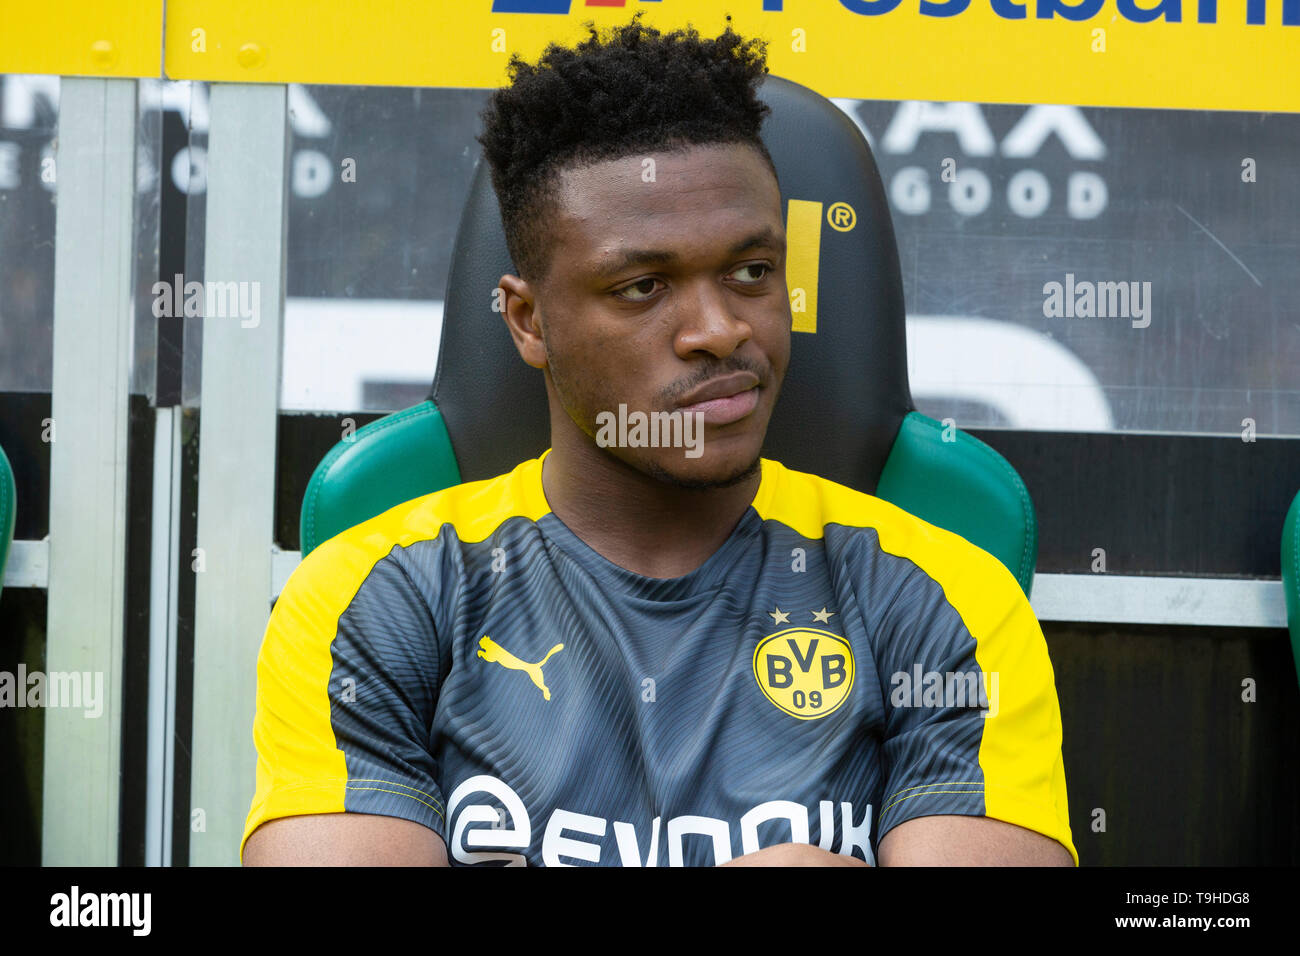 sports, football, Bundesliga, 2018/2019, Borussia Moenchengladbach vs. BVB Borussia Dortmund 0-2, Stadium Borussia Park, players bench, Dan Axel Zagadou (BVB), DFL REGULATIONS PROHIBIT ANY USE OF PHOTOGRAPHS AS IMAGE SEQUENCES AND/OR QUASI-VIDEO - Stock Image